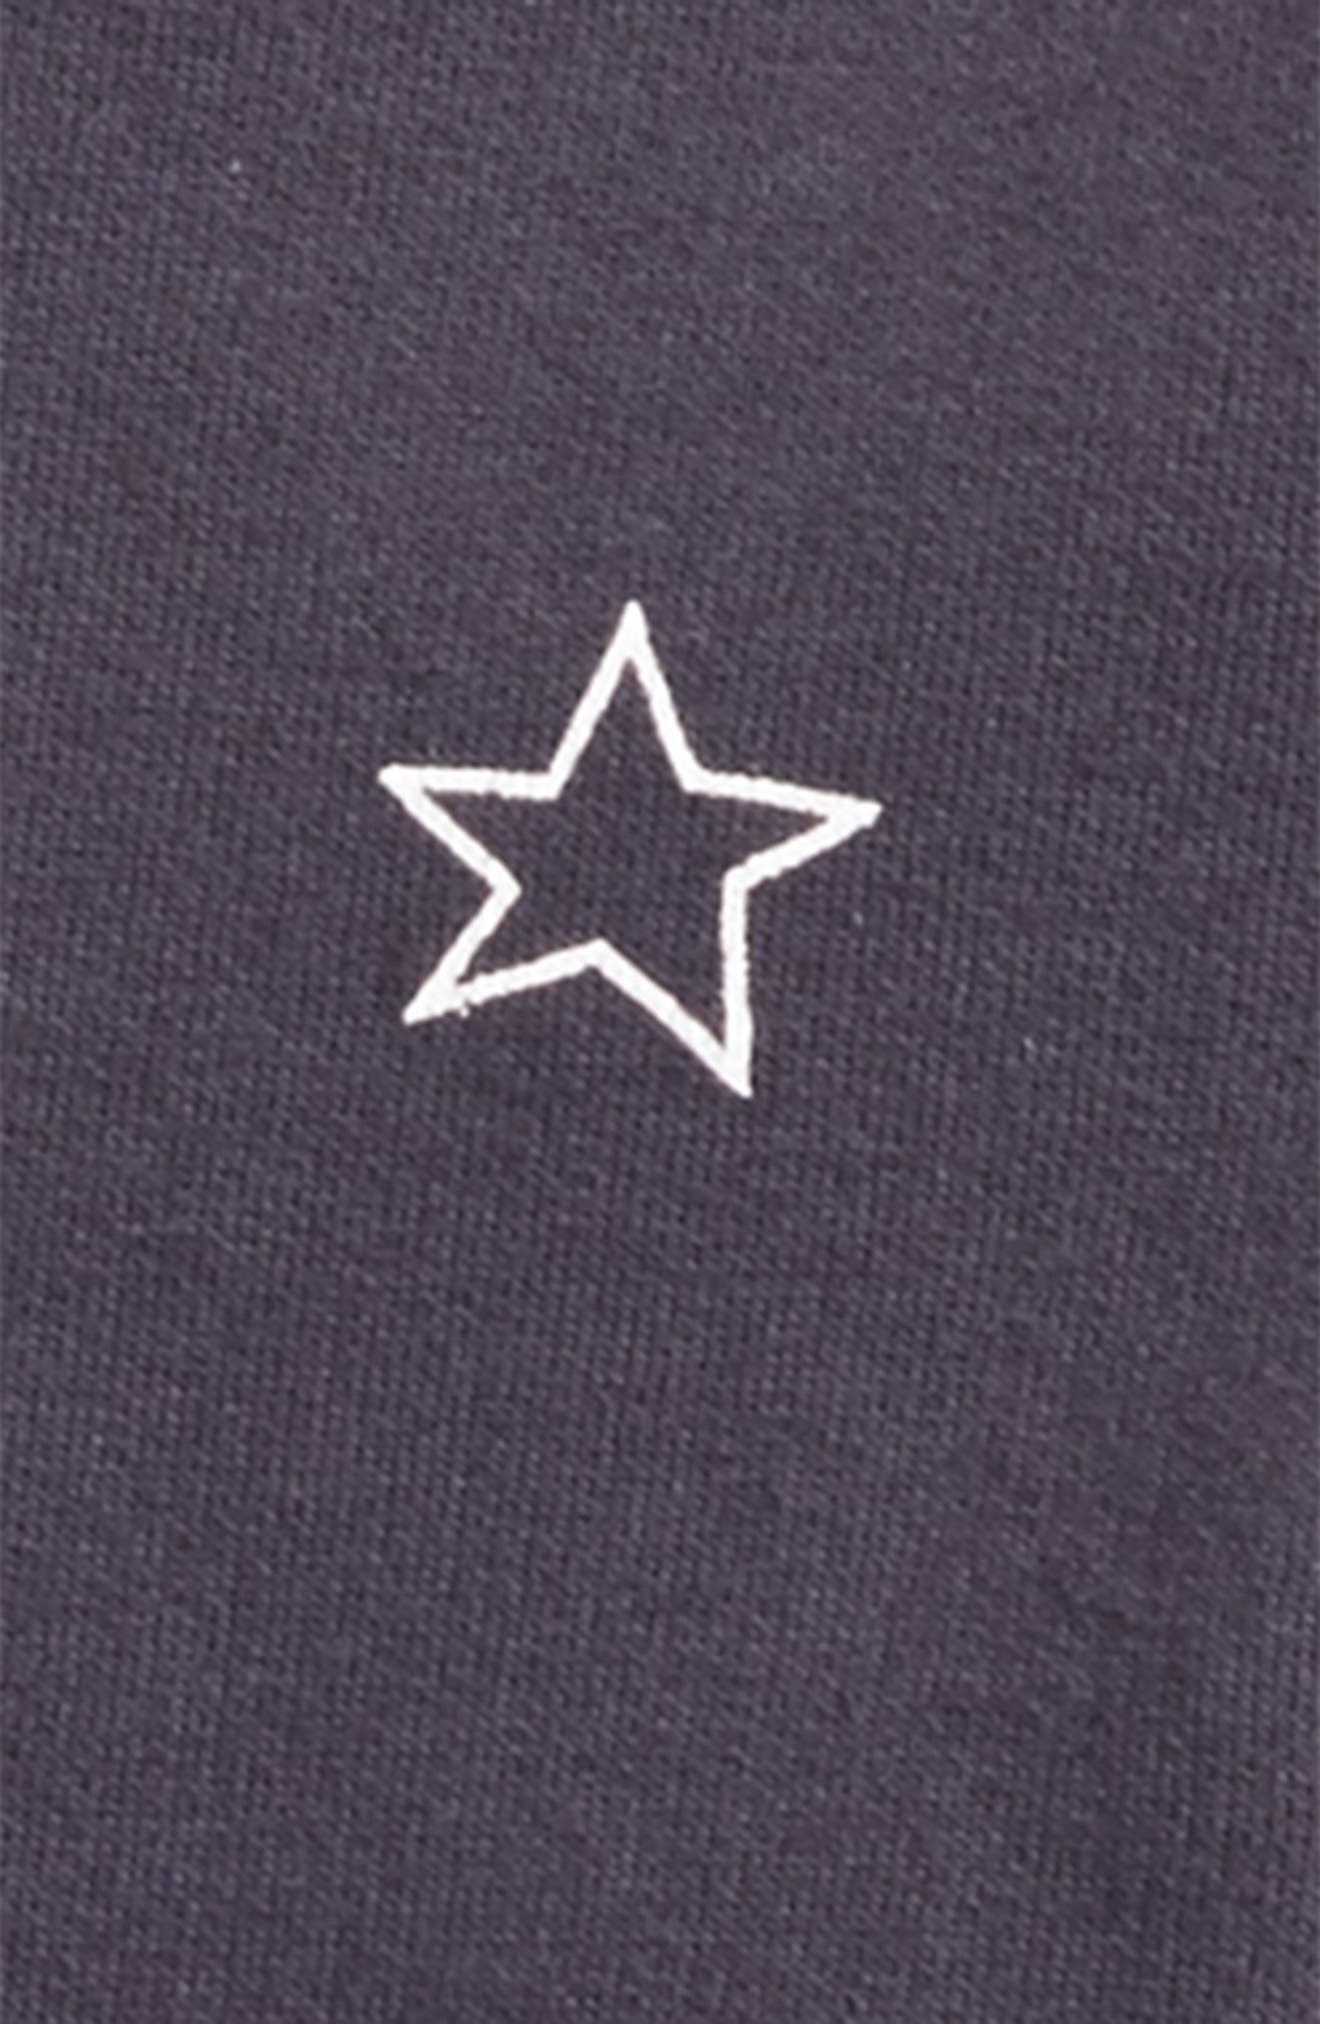 Star Print Baseball Jacket,                             Alternate thumbnail 2, color,                             400